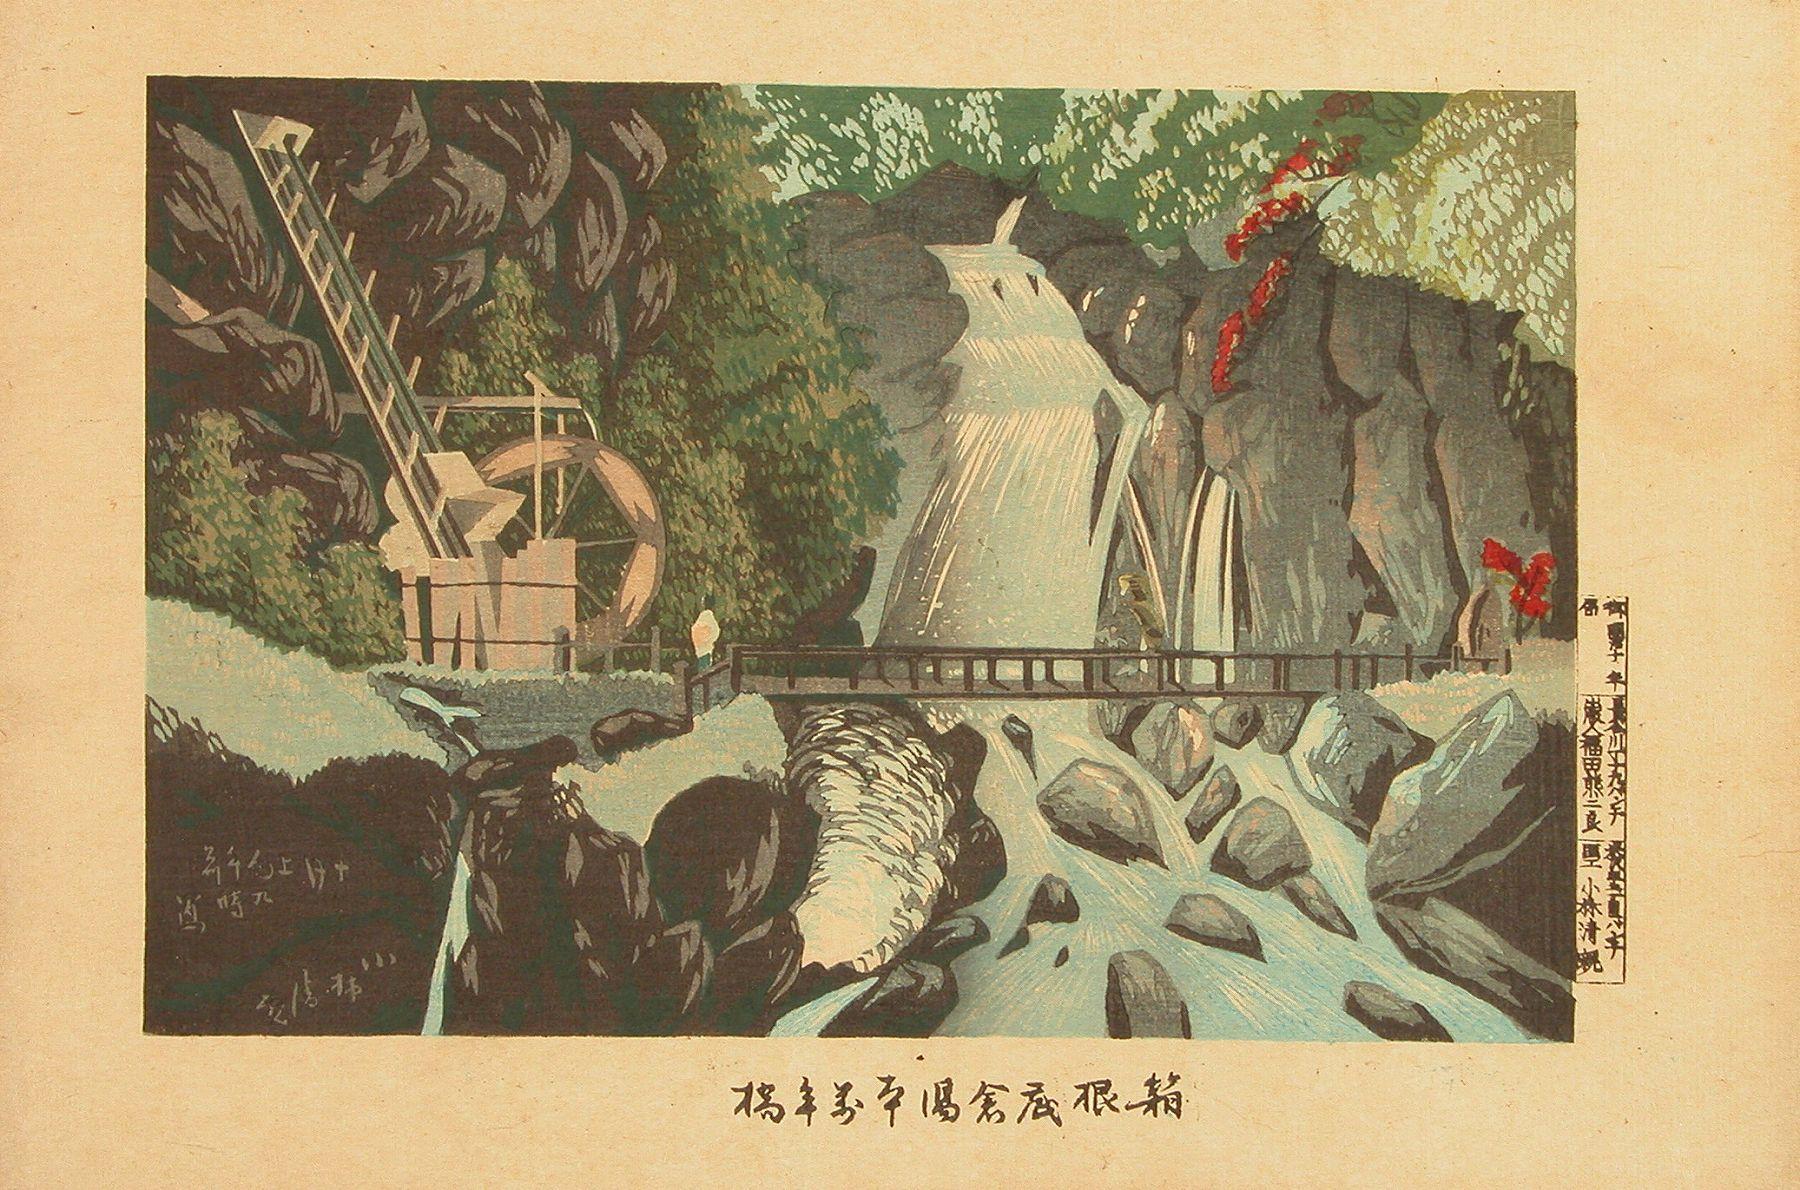 KIYOCHIKA Hakone Sokokura yumoto Mannnenbashi (Mannen Bridge at the source of the Sokokura hot spring in Hakone)